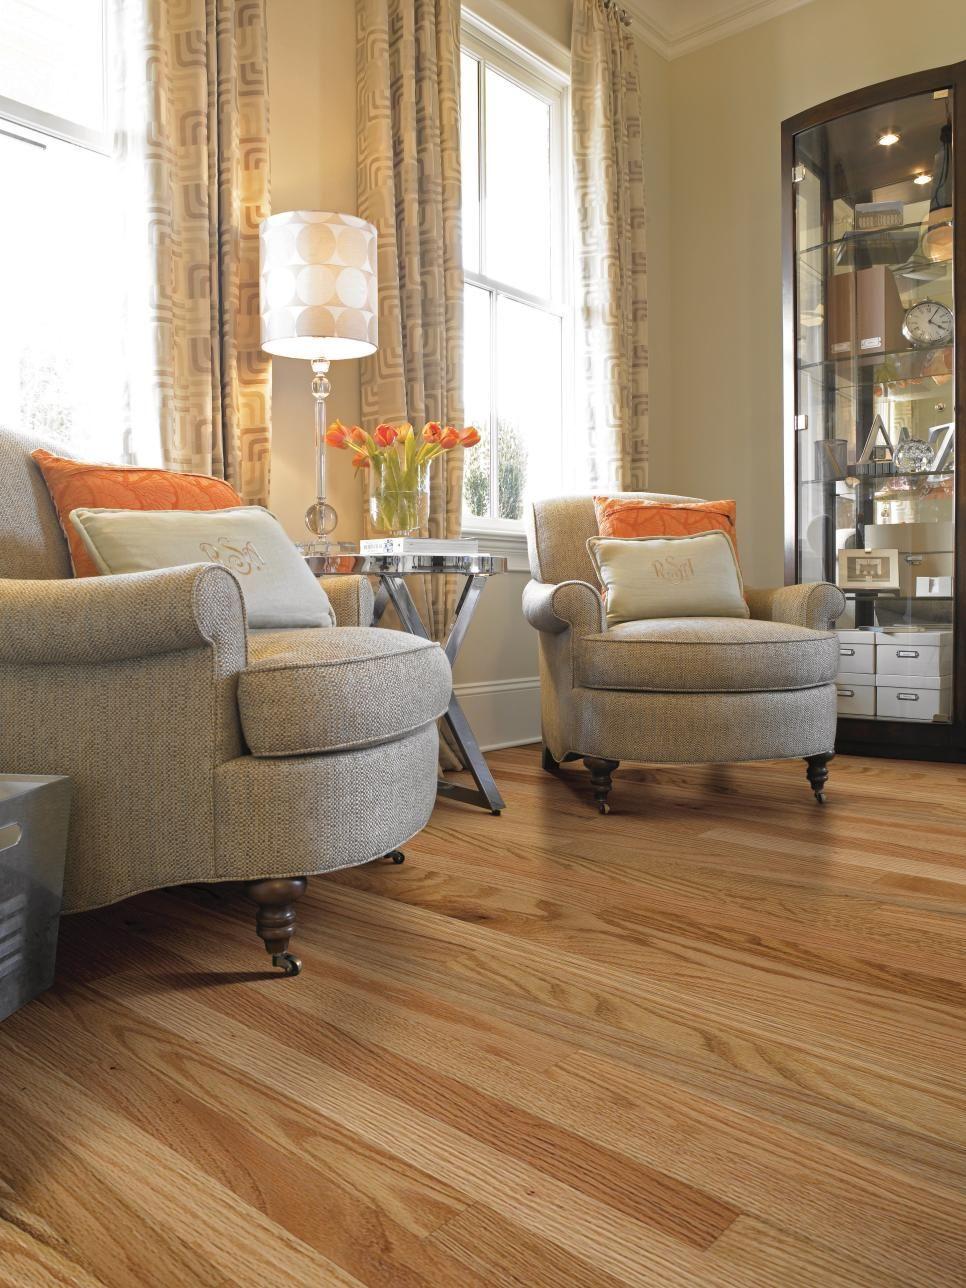 Stunning Hardwood Flooring Options Pinterest Red Oak Living - Most popular flooring for living rooms